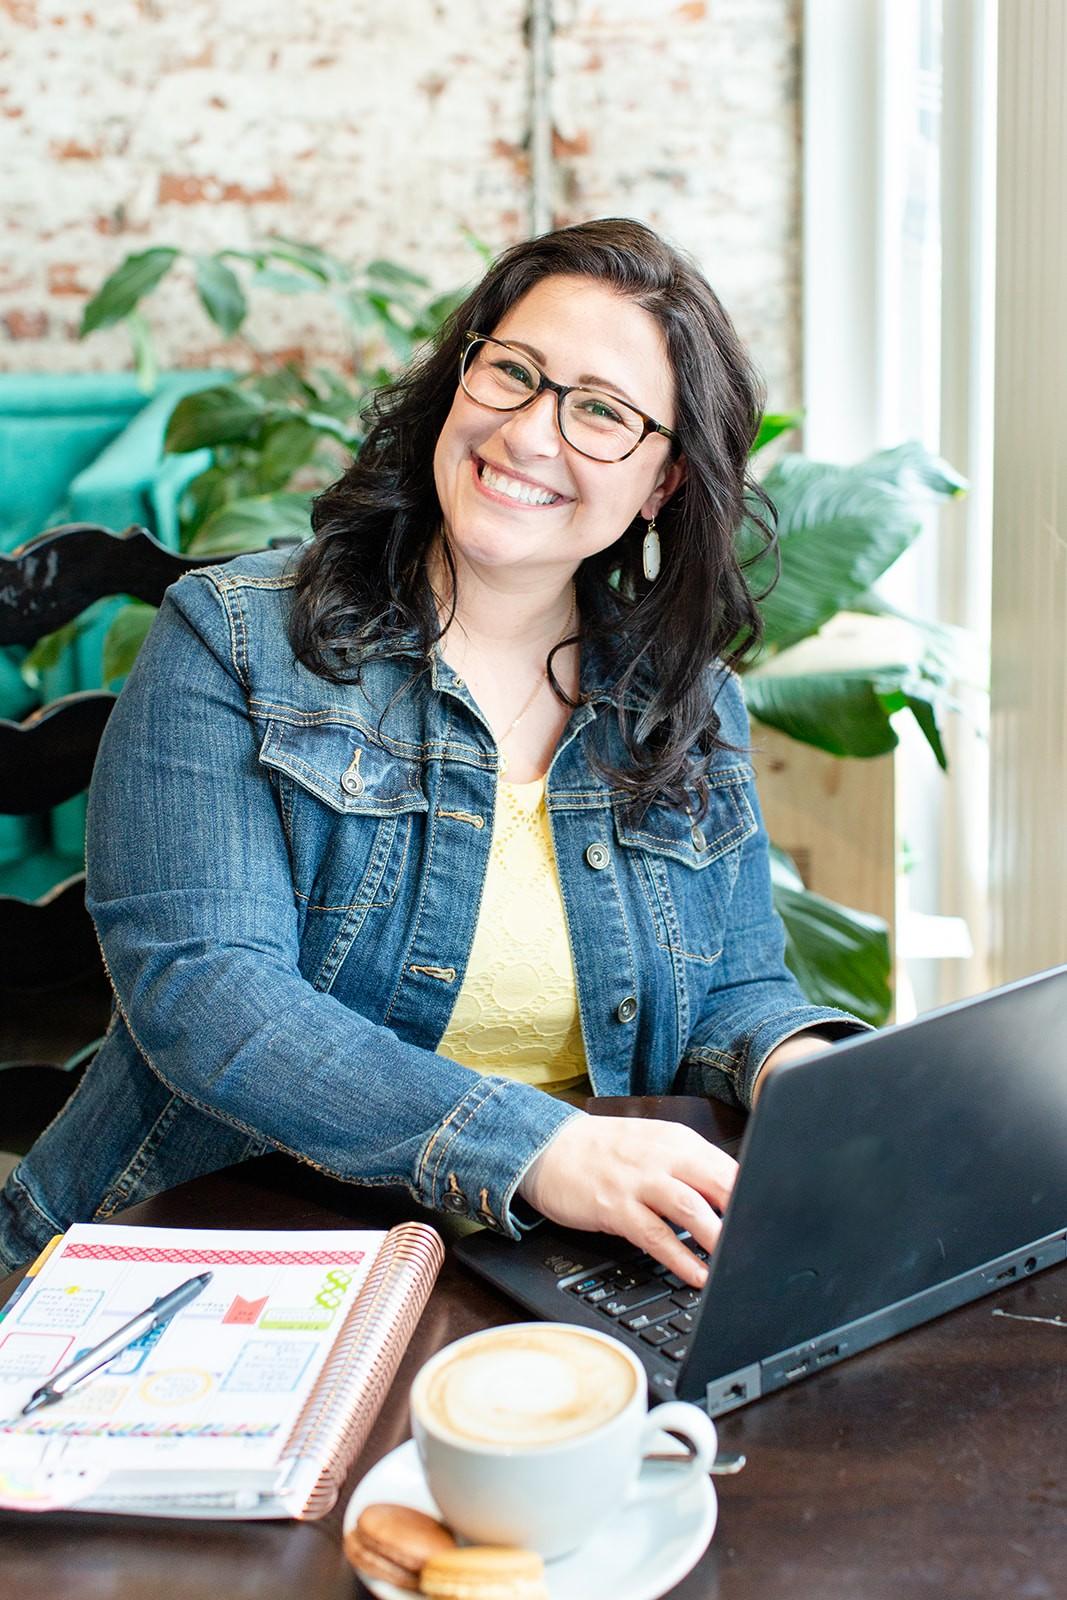 10 Questions with Julie Schlueter